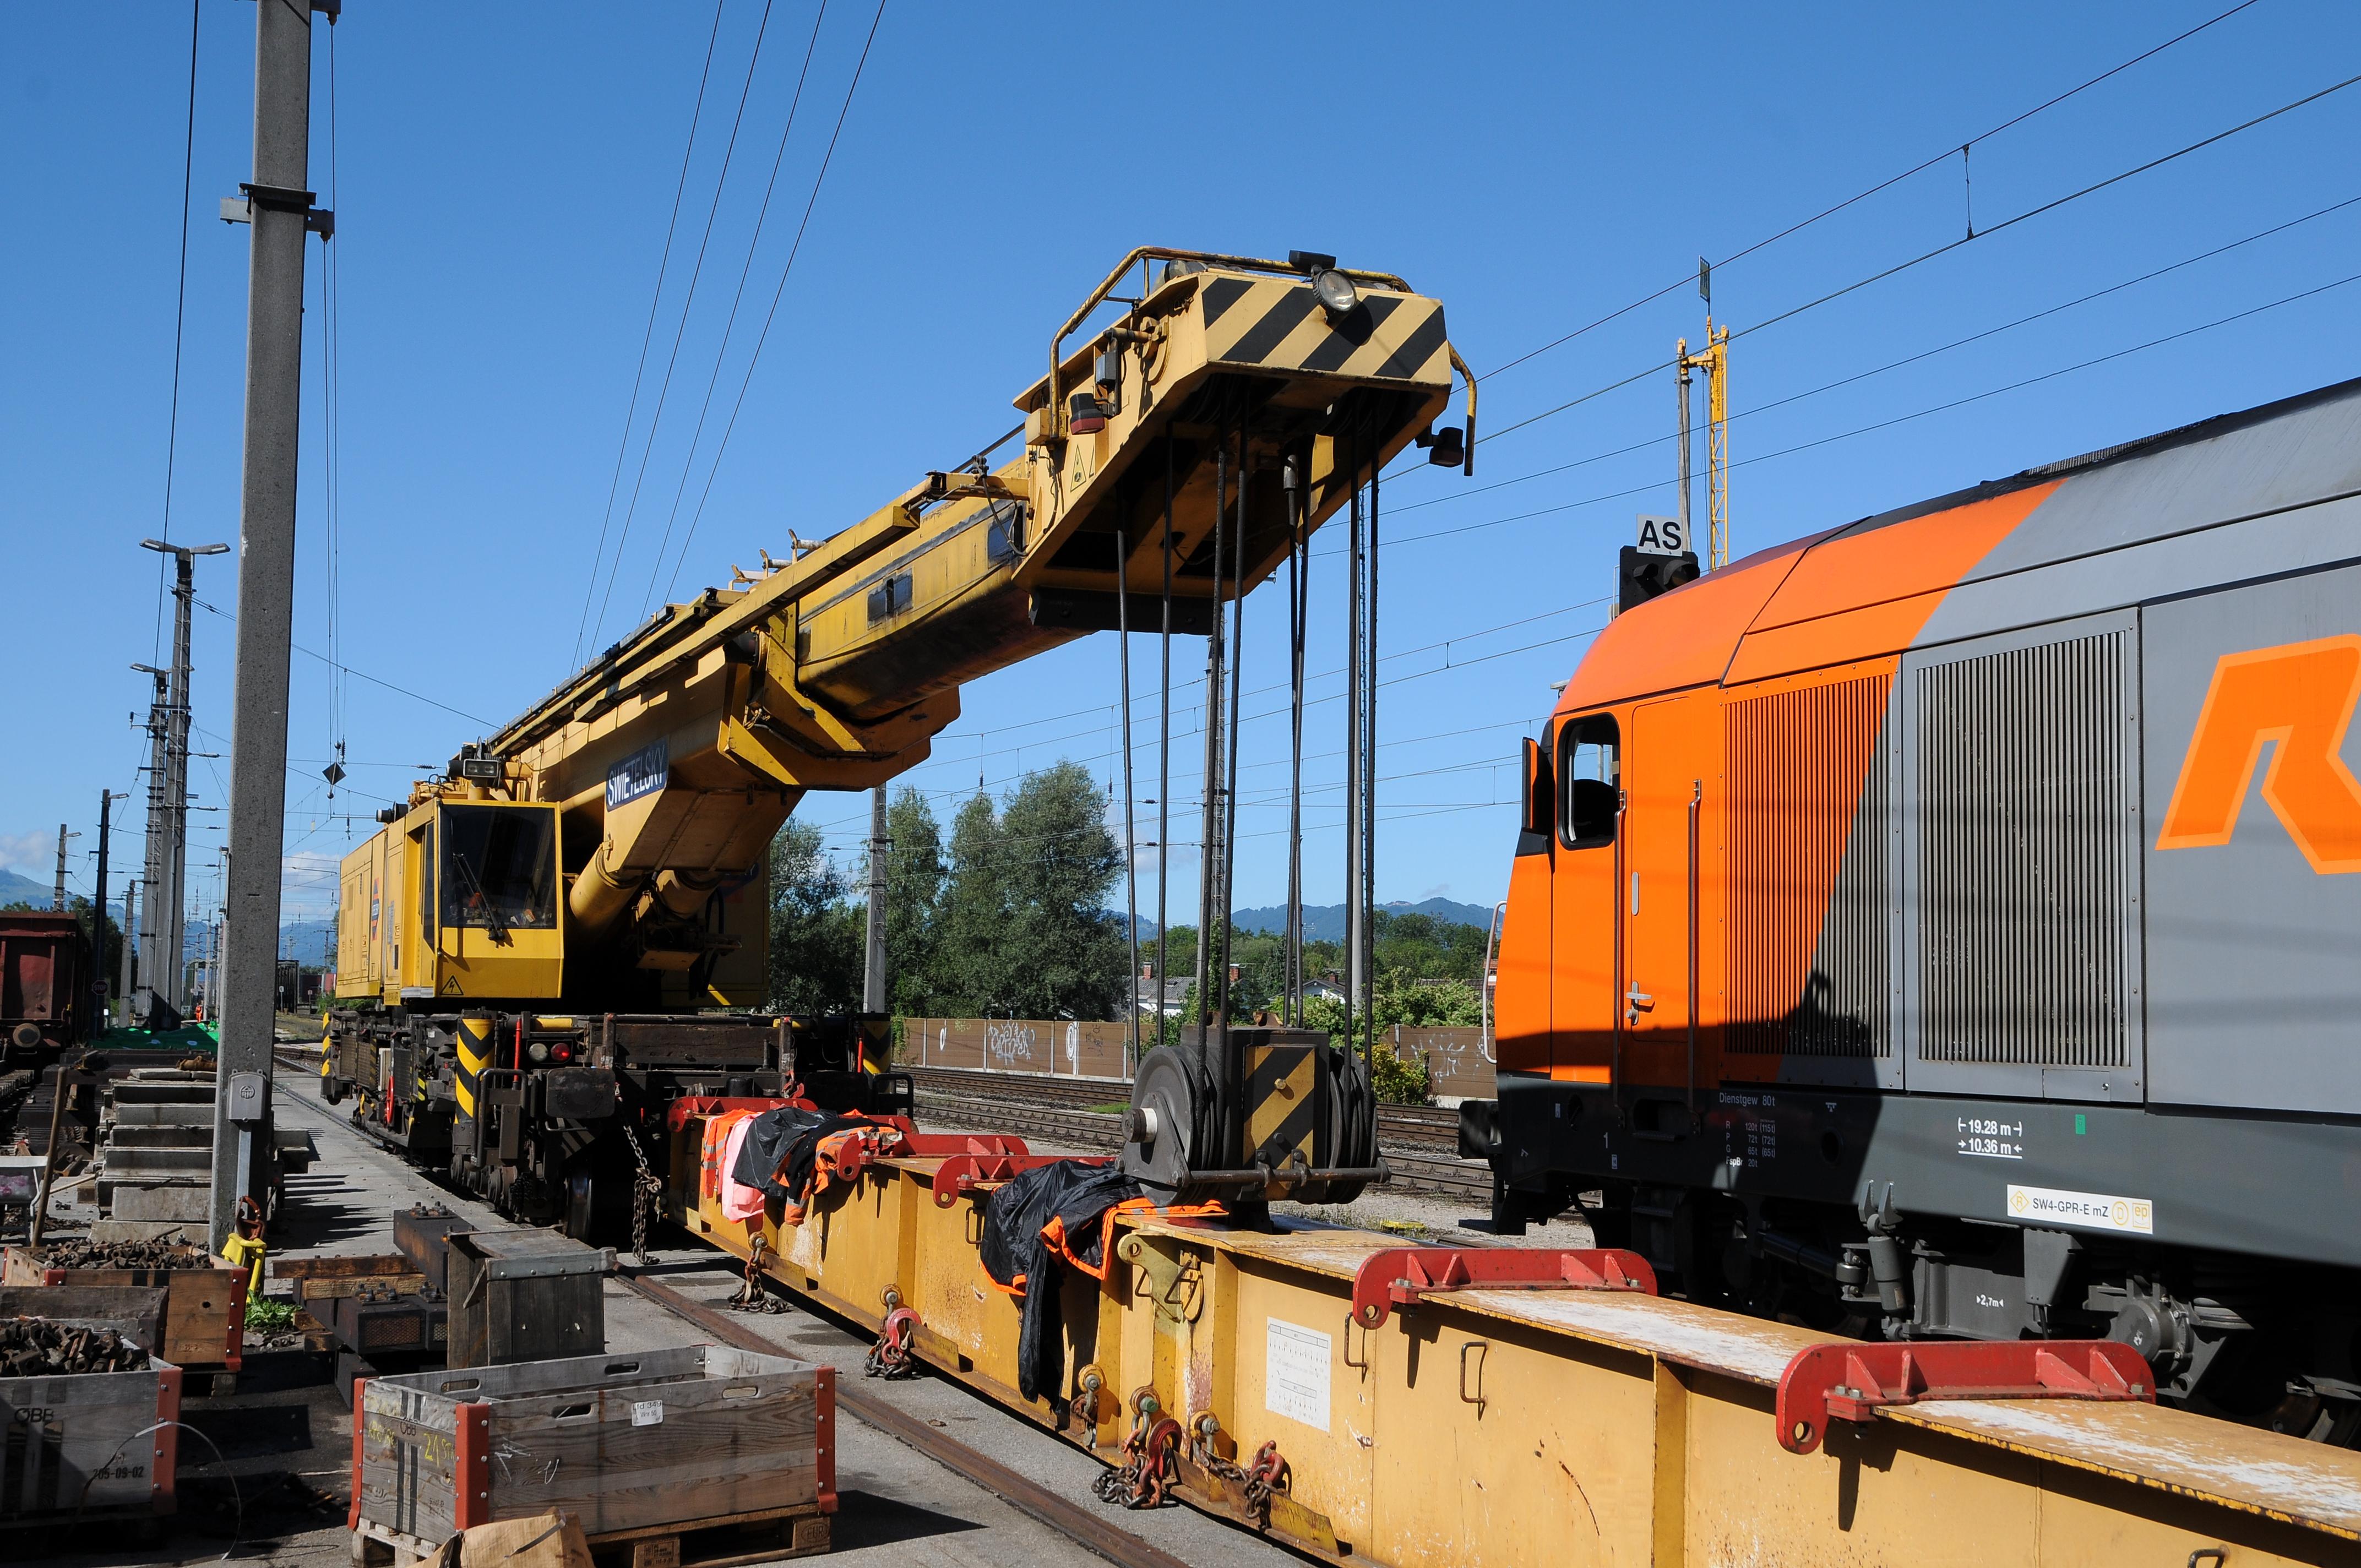 reg the scrapyard crane - photo #8